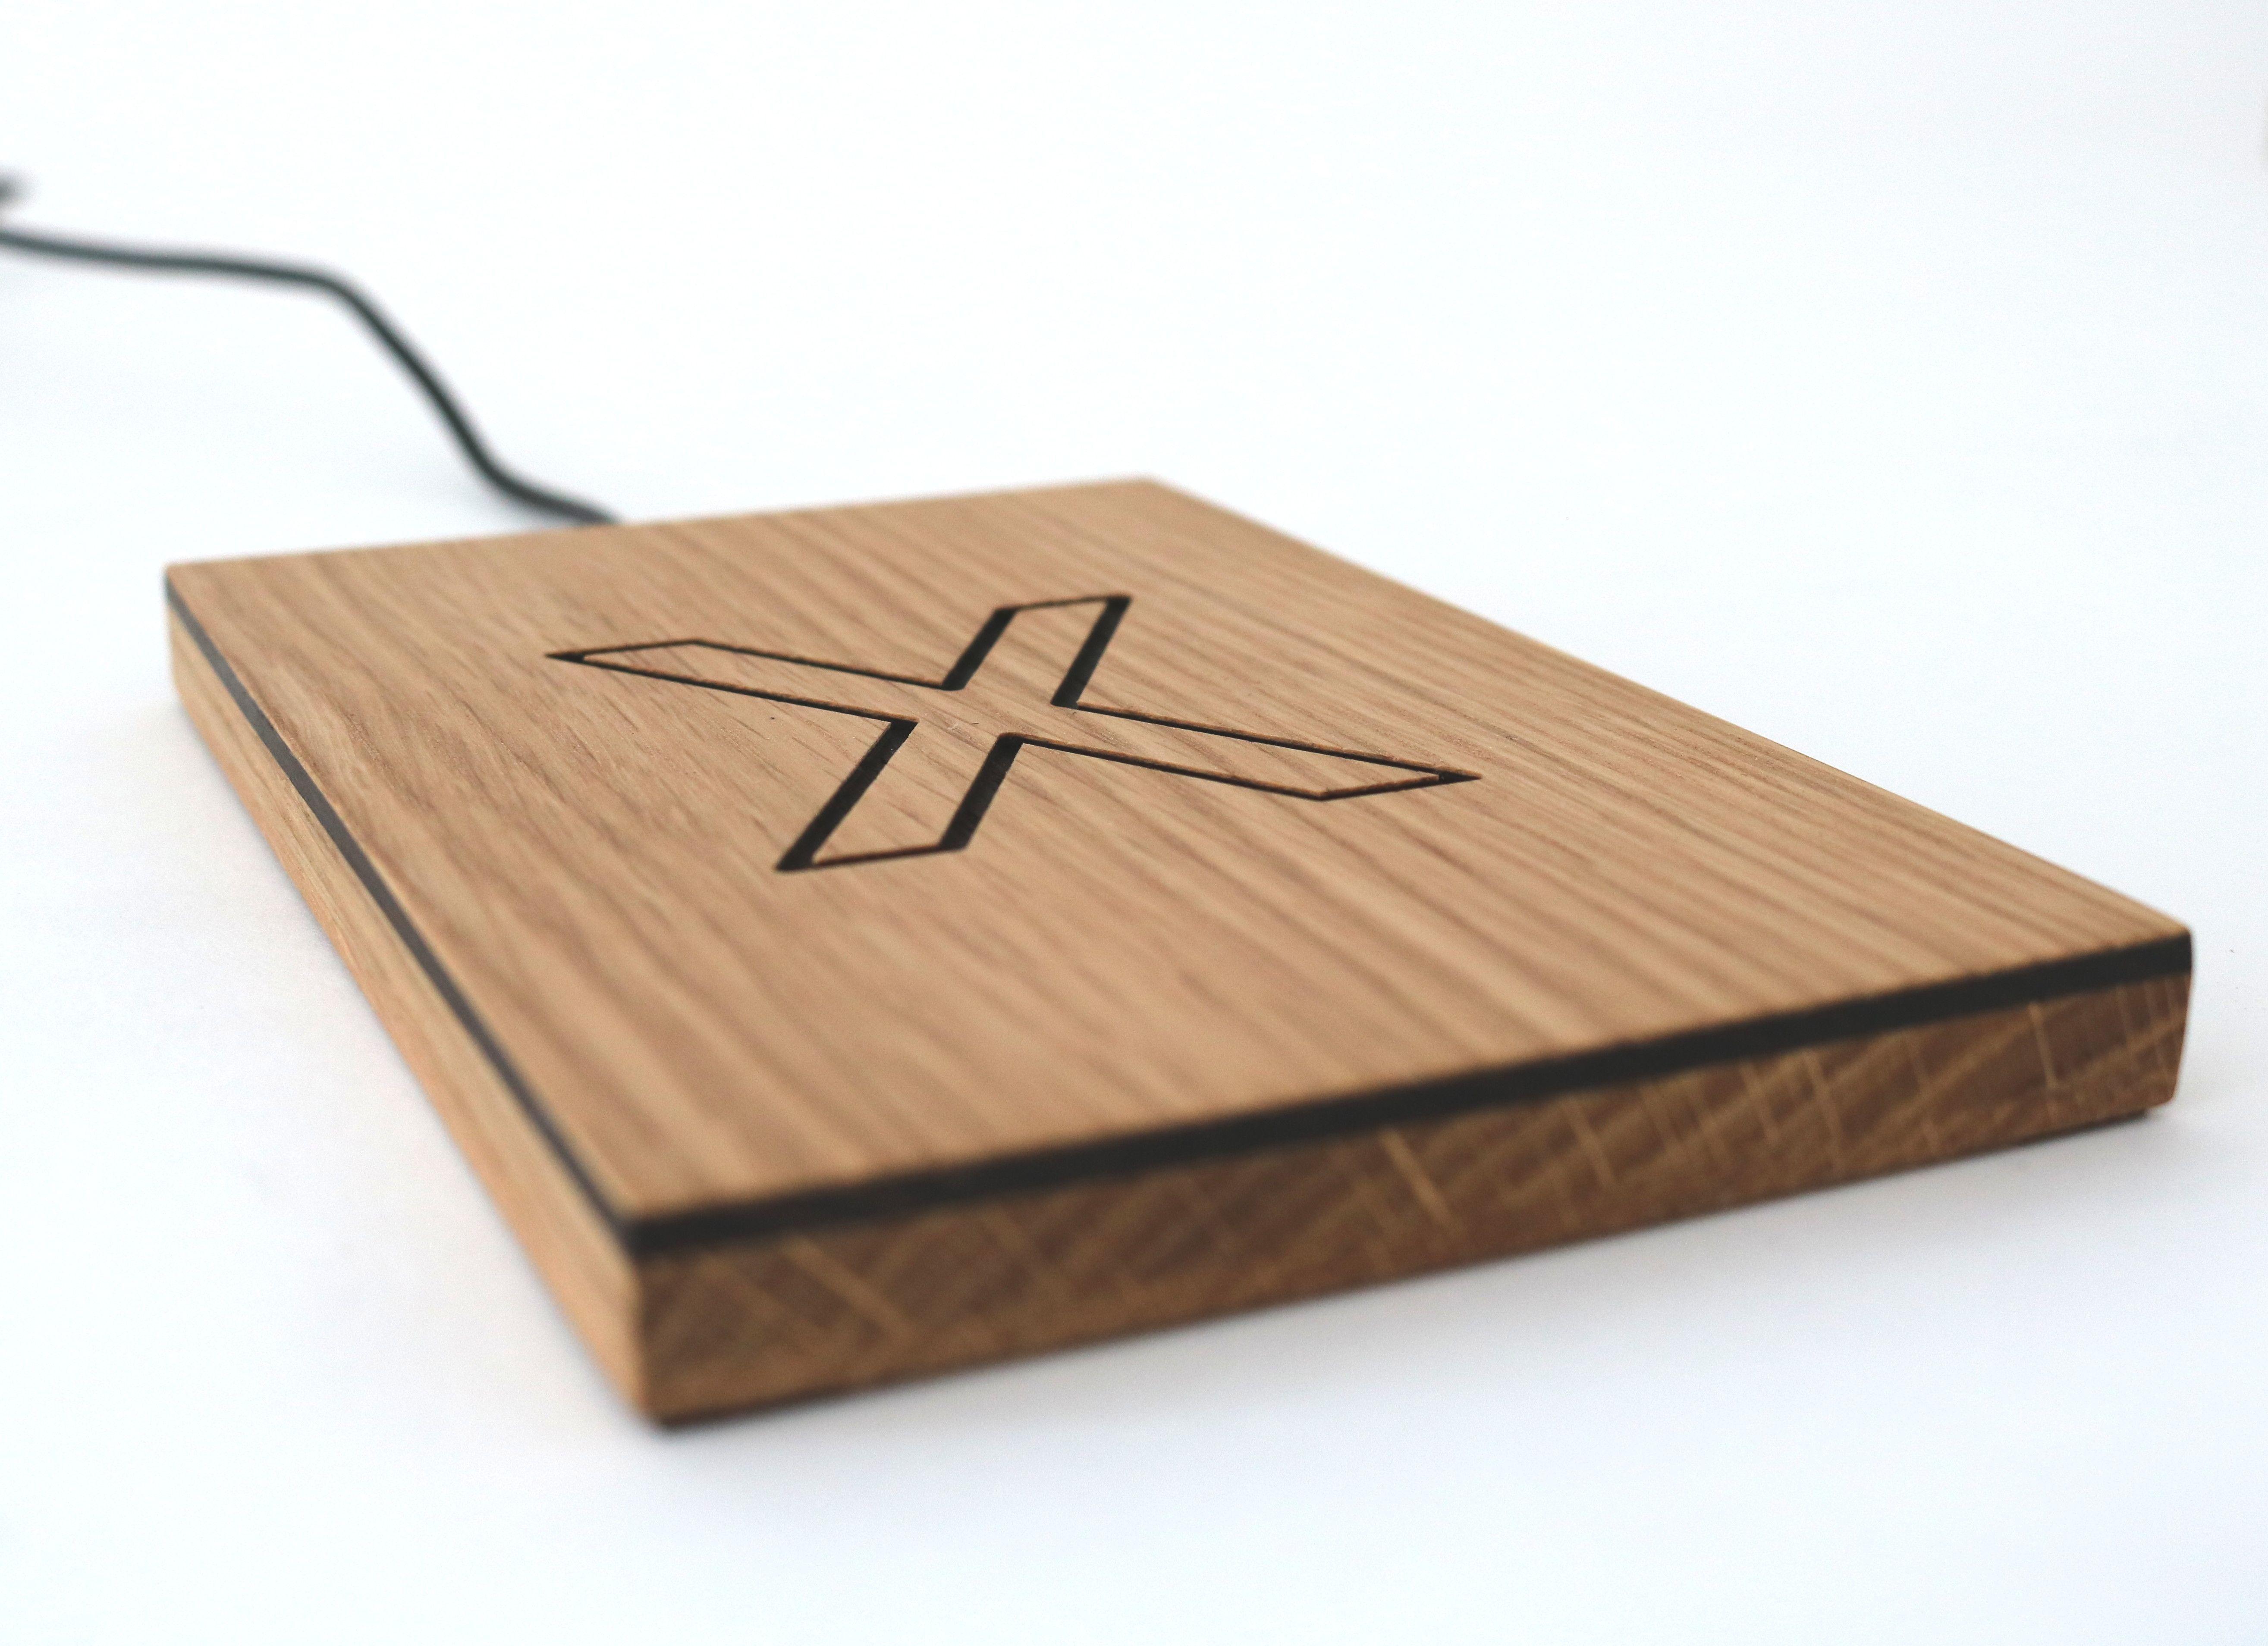 Induktive Ladestation Aus Holz Fur Iphone X Ladestation Iphone Technik